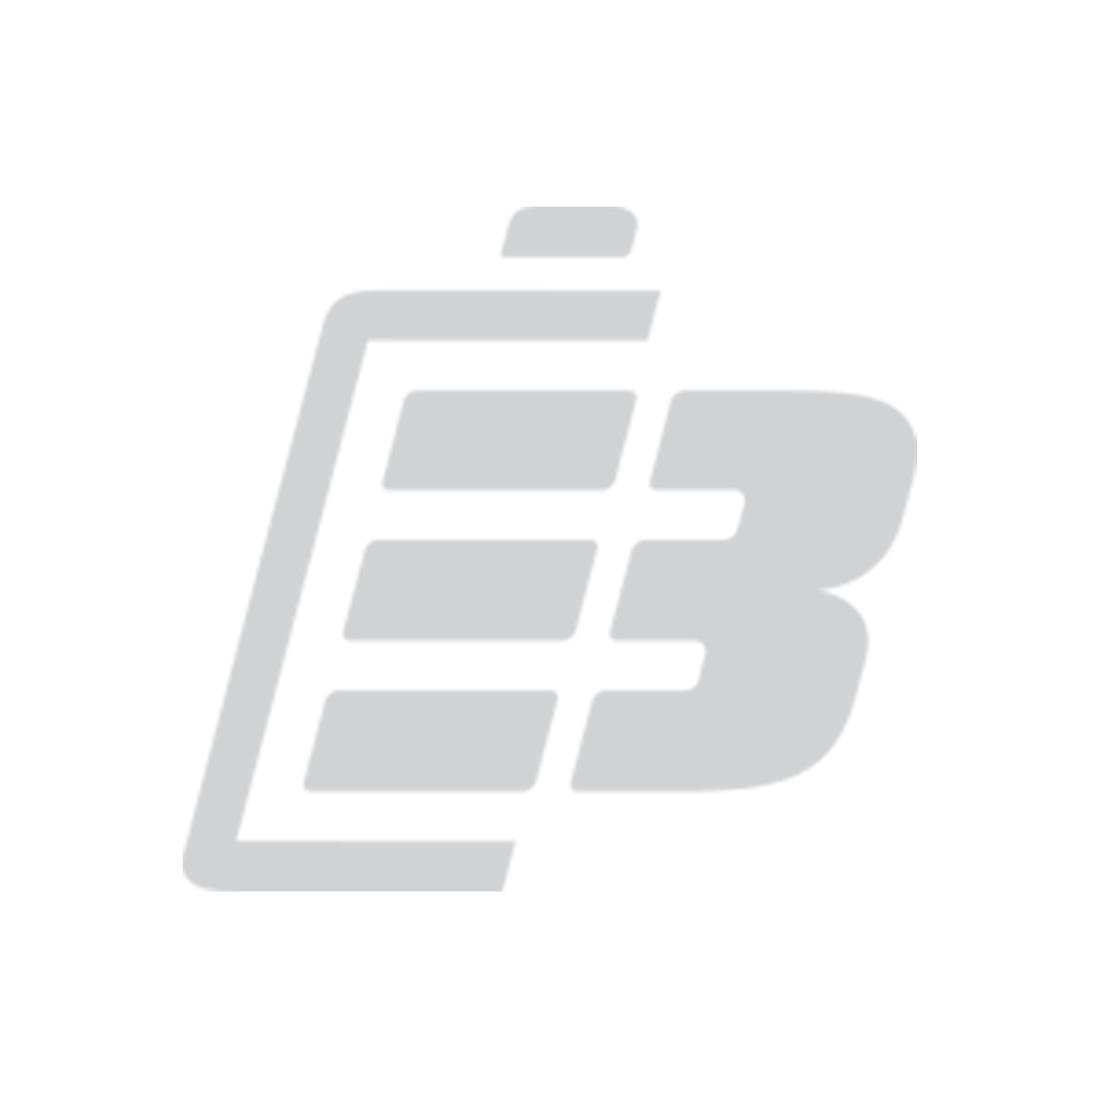 Cordless phone battery Avaya Tenovis Integral D3 Mobile_1